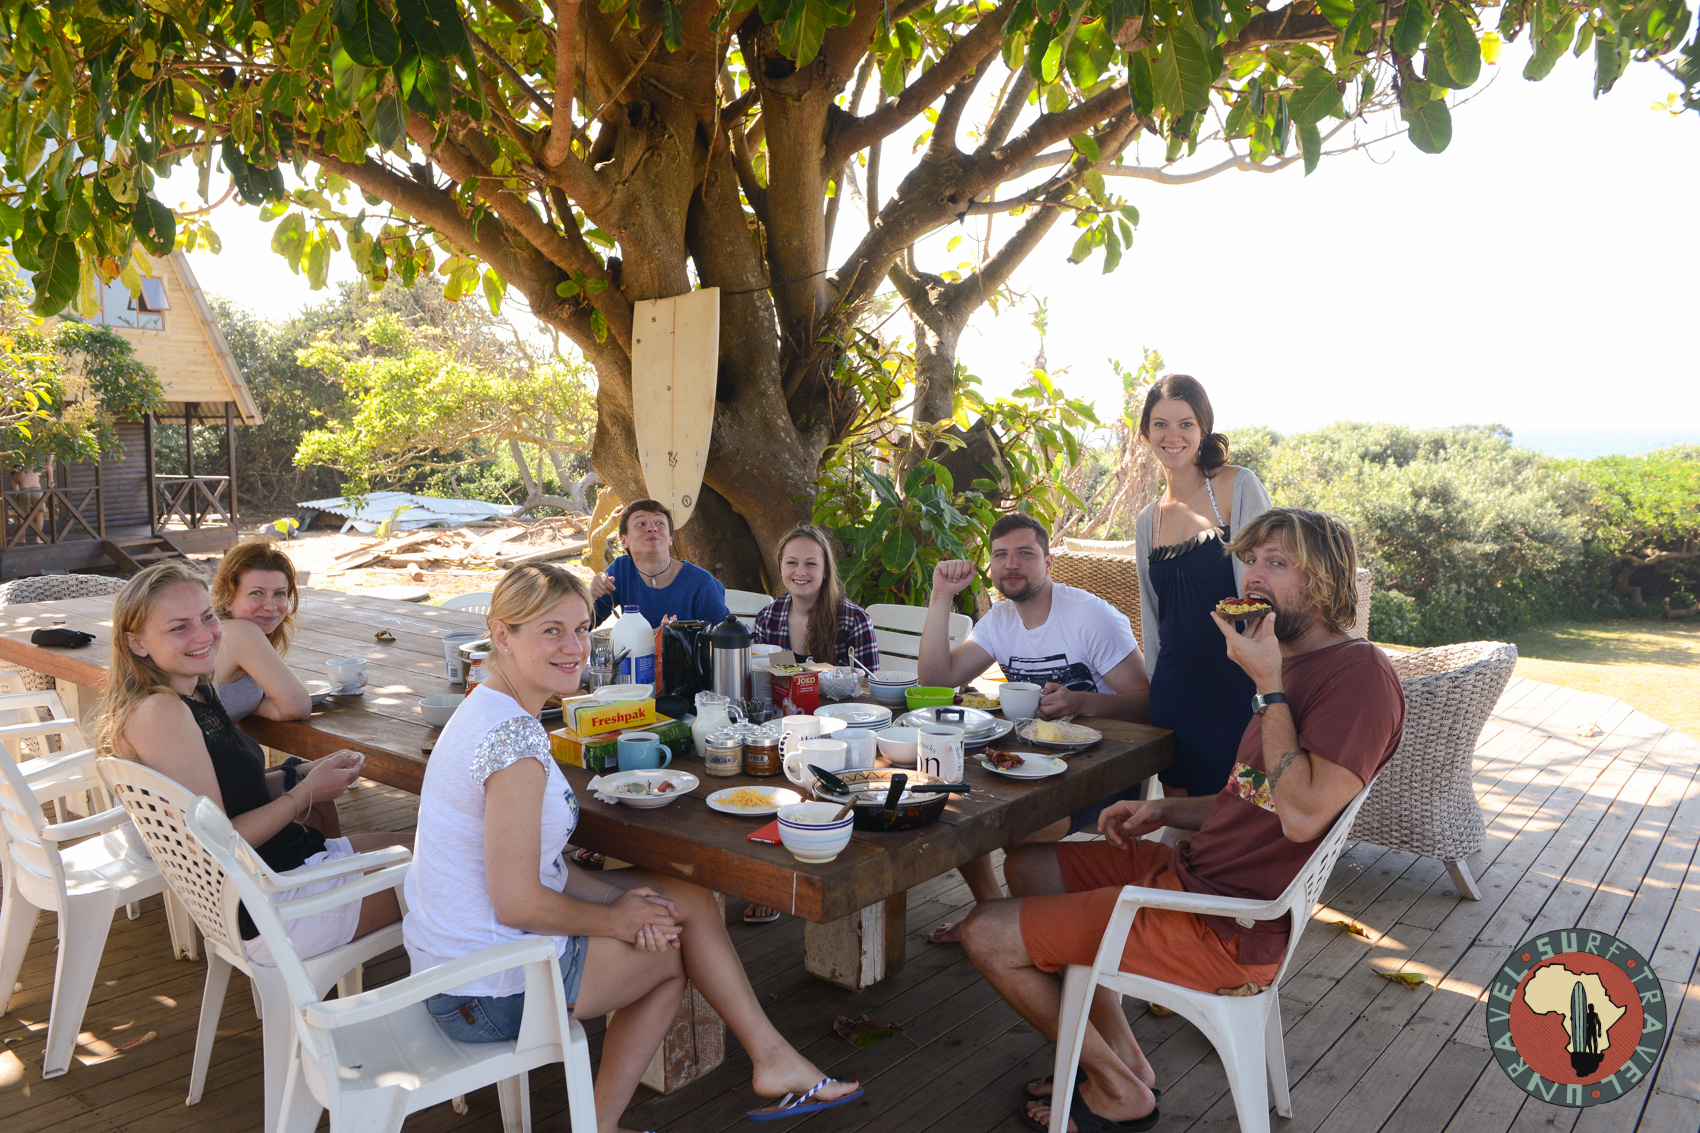 Серф трип Квазулу-Натал ЮАР Unravel Surf Travel